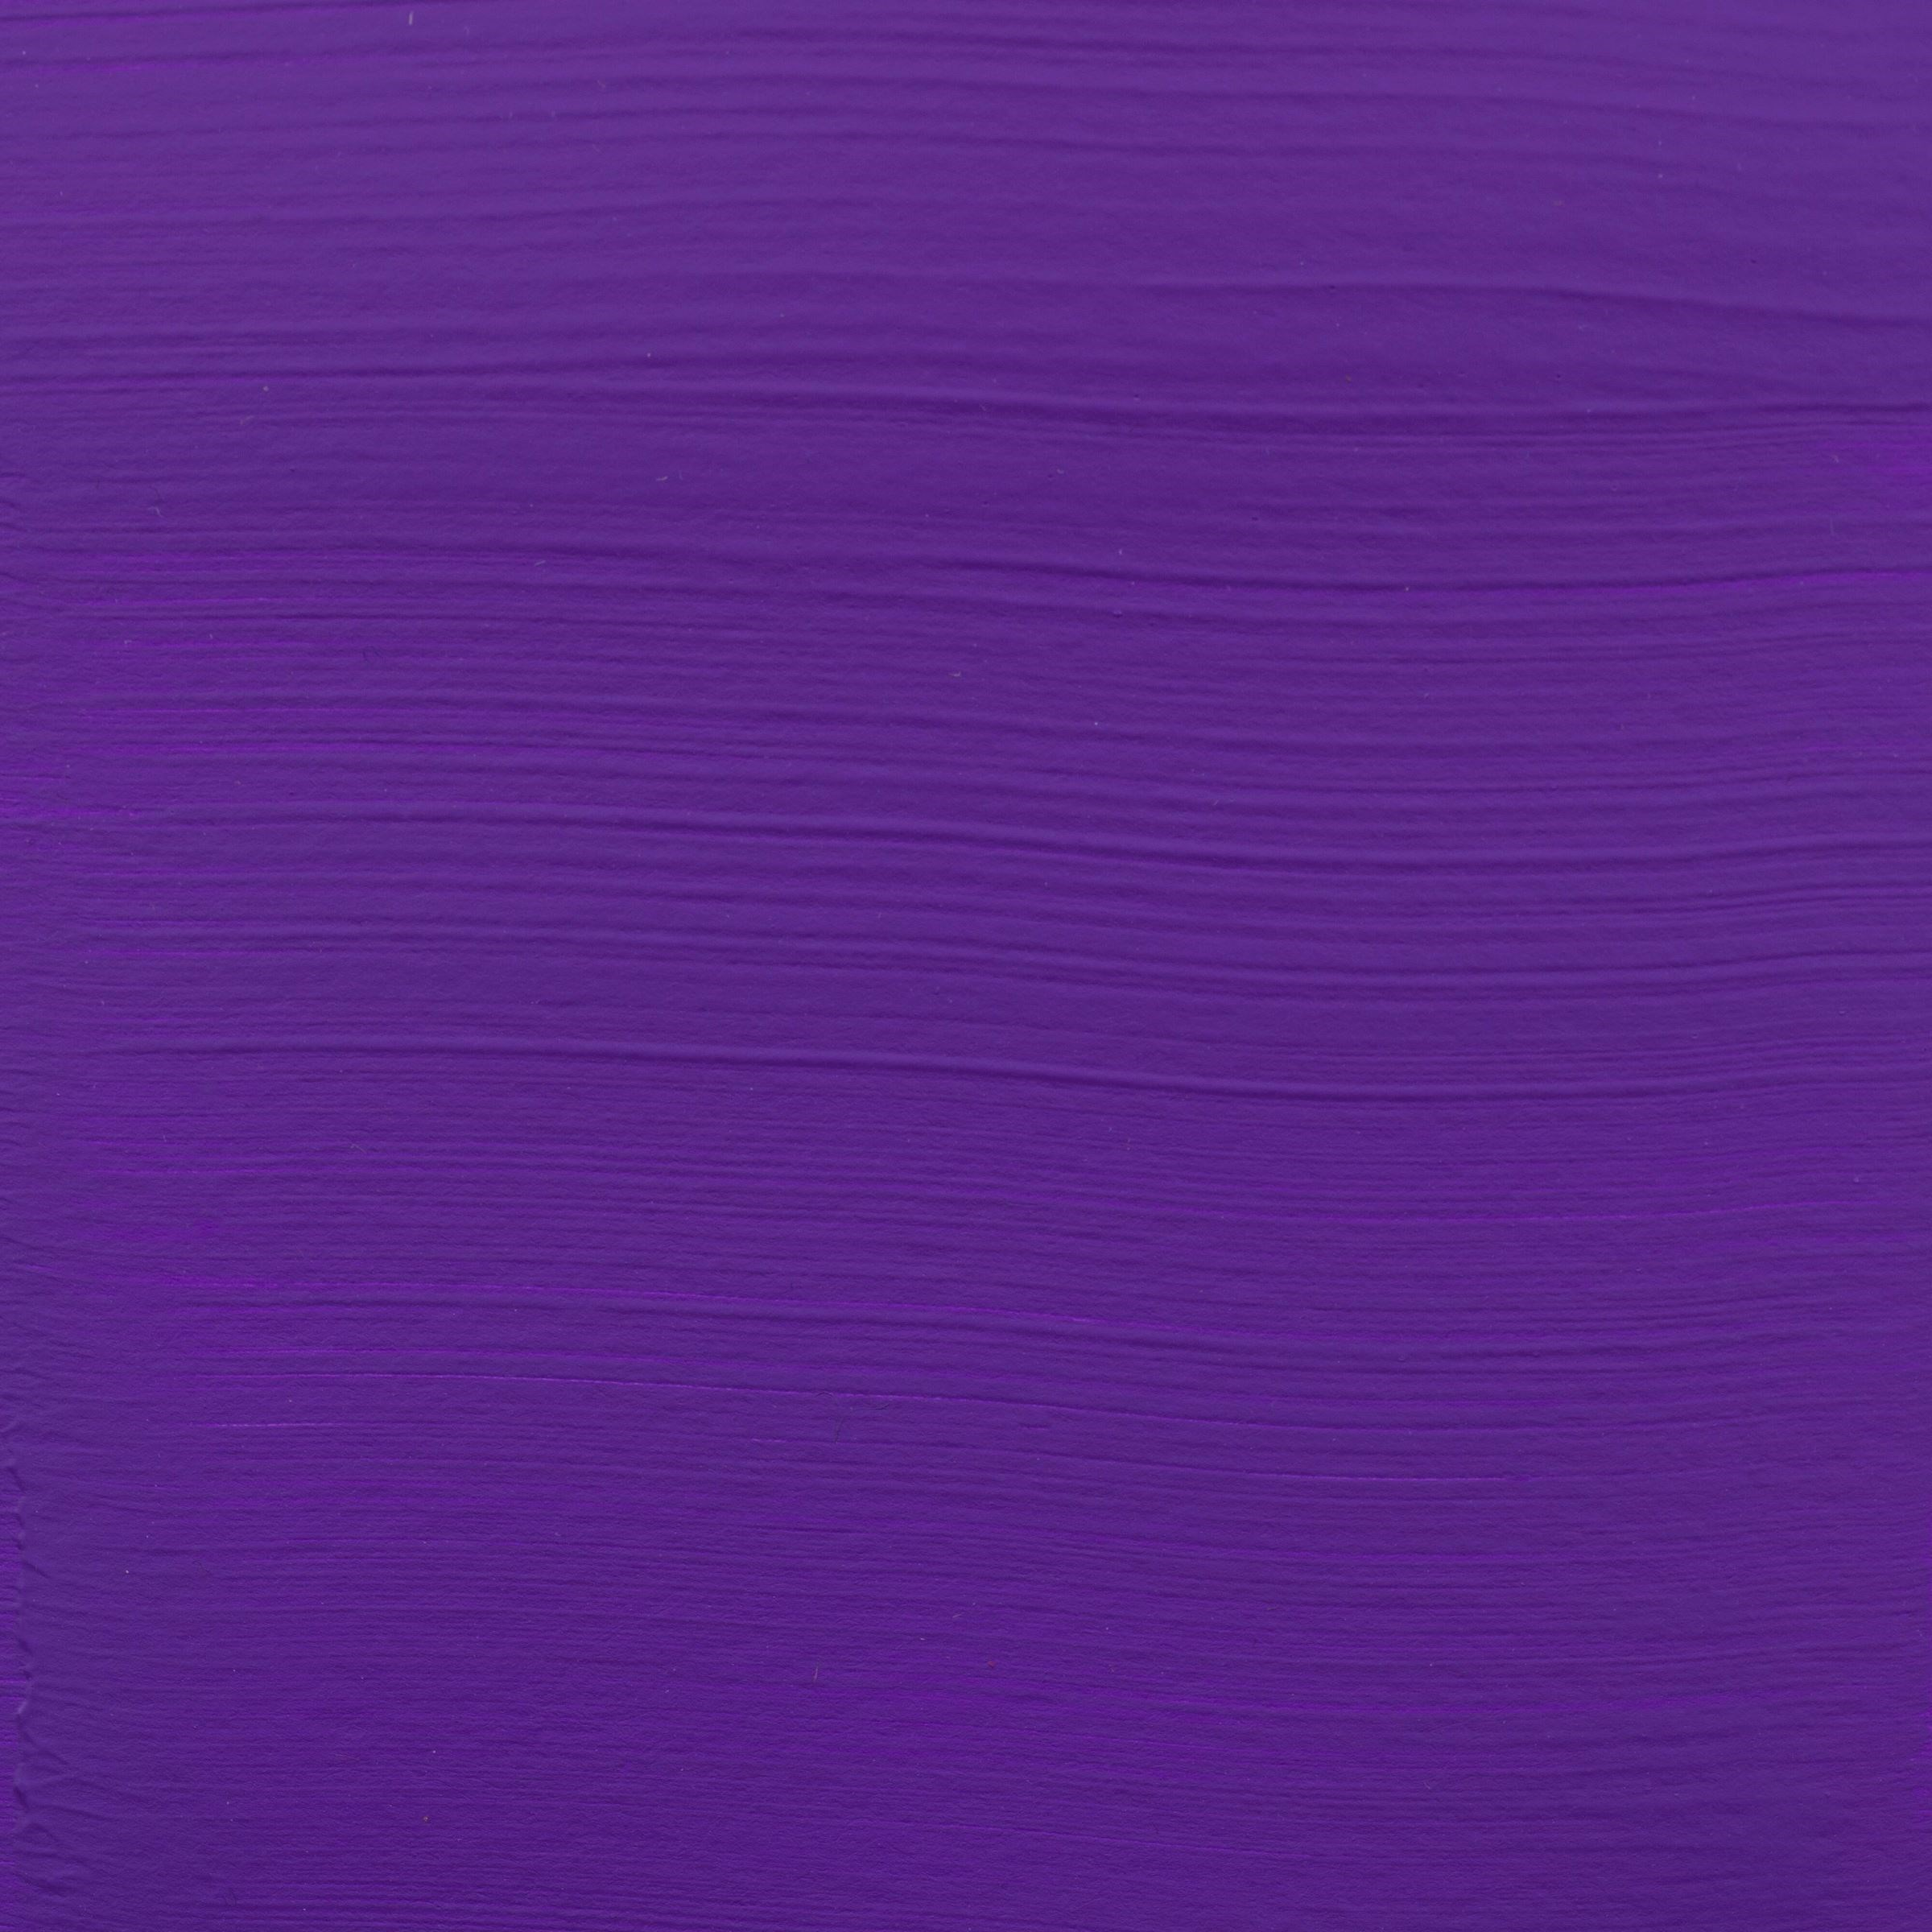 Amsterdam acrylverf Ultramarijnviolet 507 Angelart kunst en zo